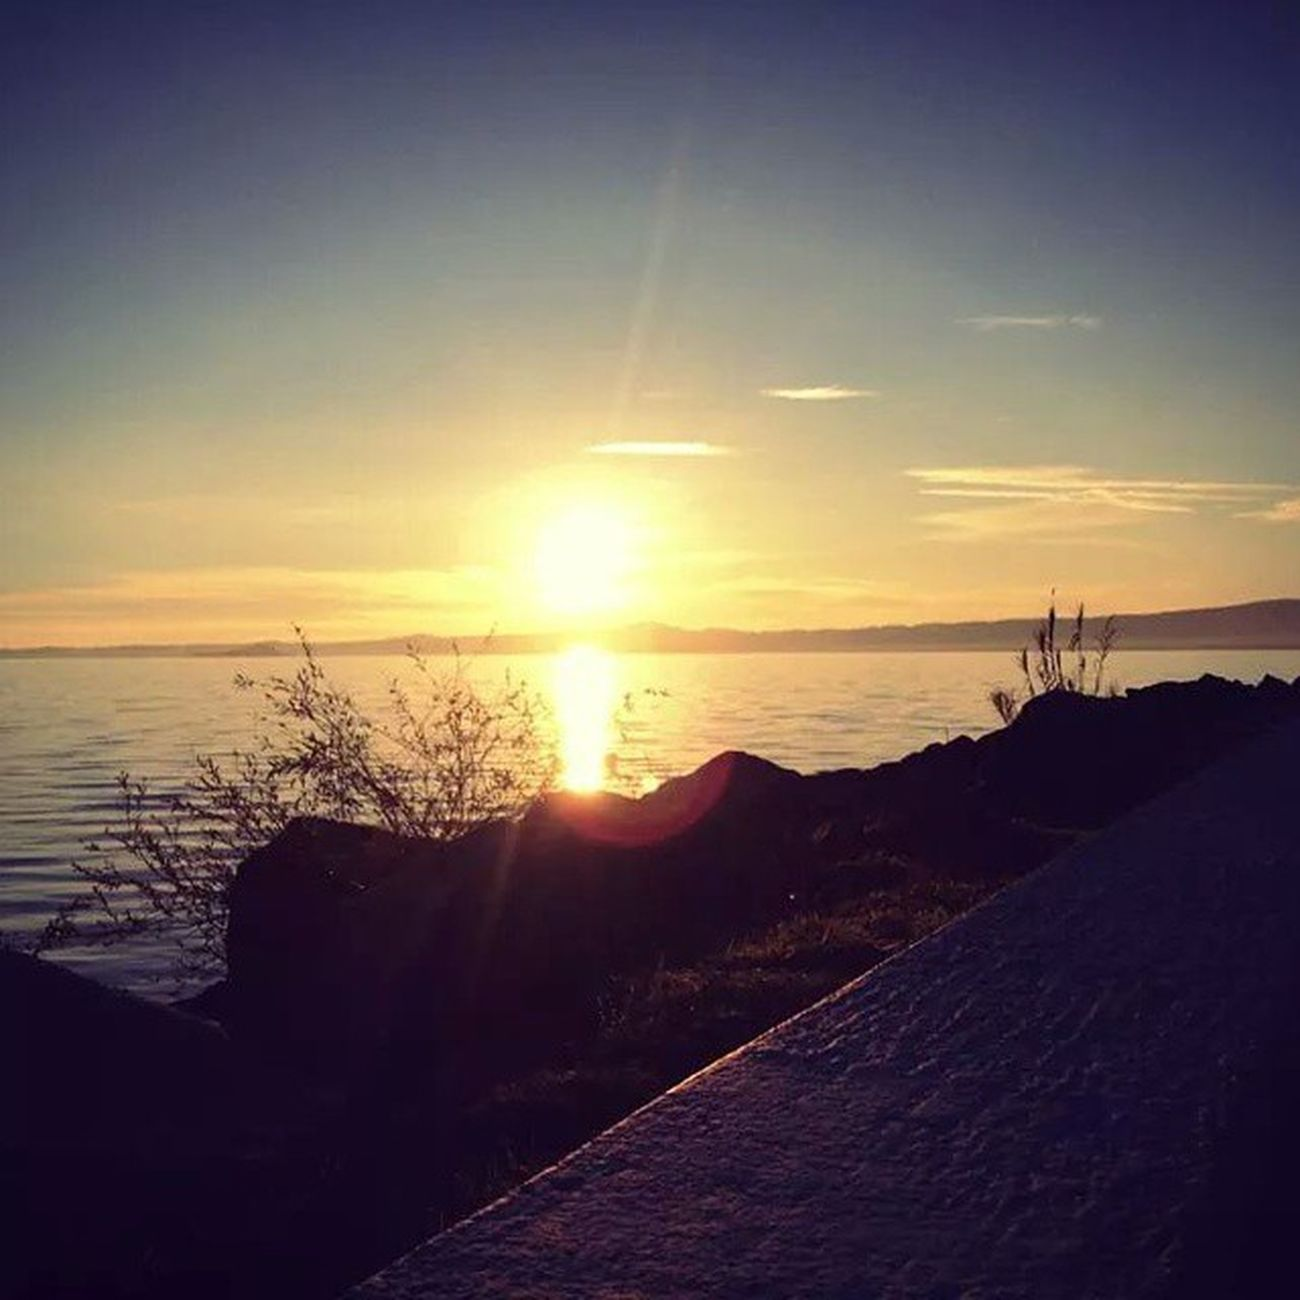 Lago Lake Bolsena Bolsenalake Umbria Viterbo Landscape Visittuscia Lazio Visitbolsena Instanature Natura Instavacation Etruria Estestest Paesaggio Tusciafotografia Tuscania Tramonto Sunshine Annonuovo Sunset Sole Inverno Sunnyday